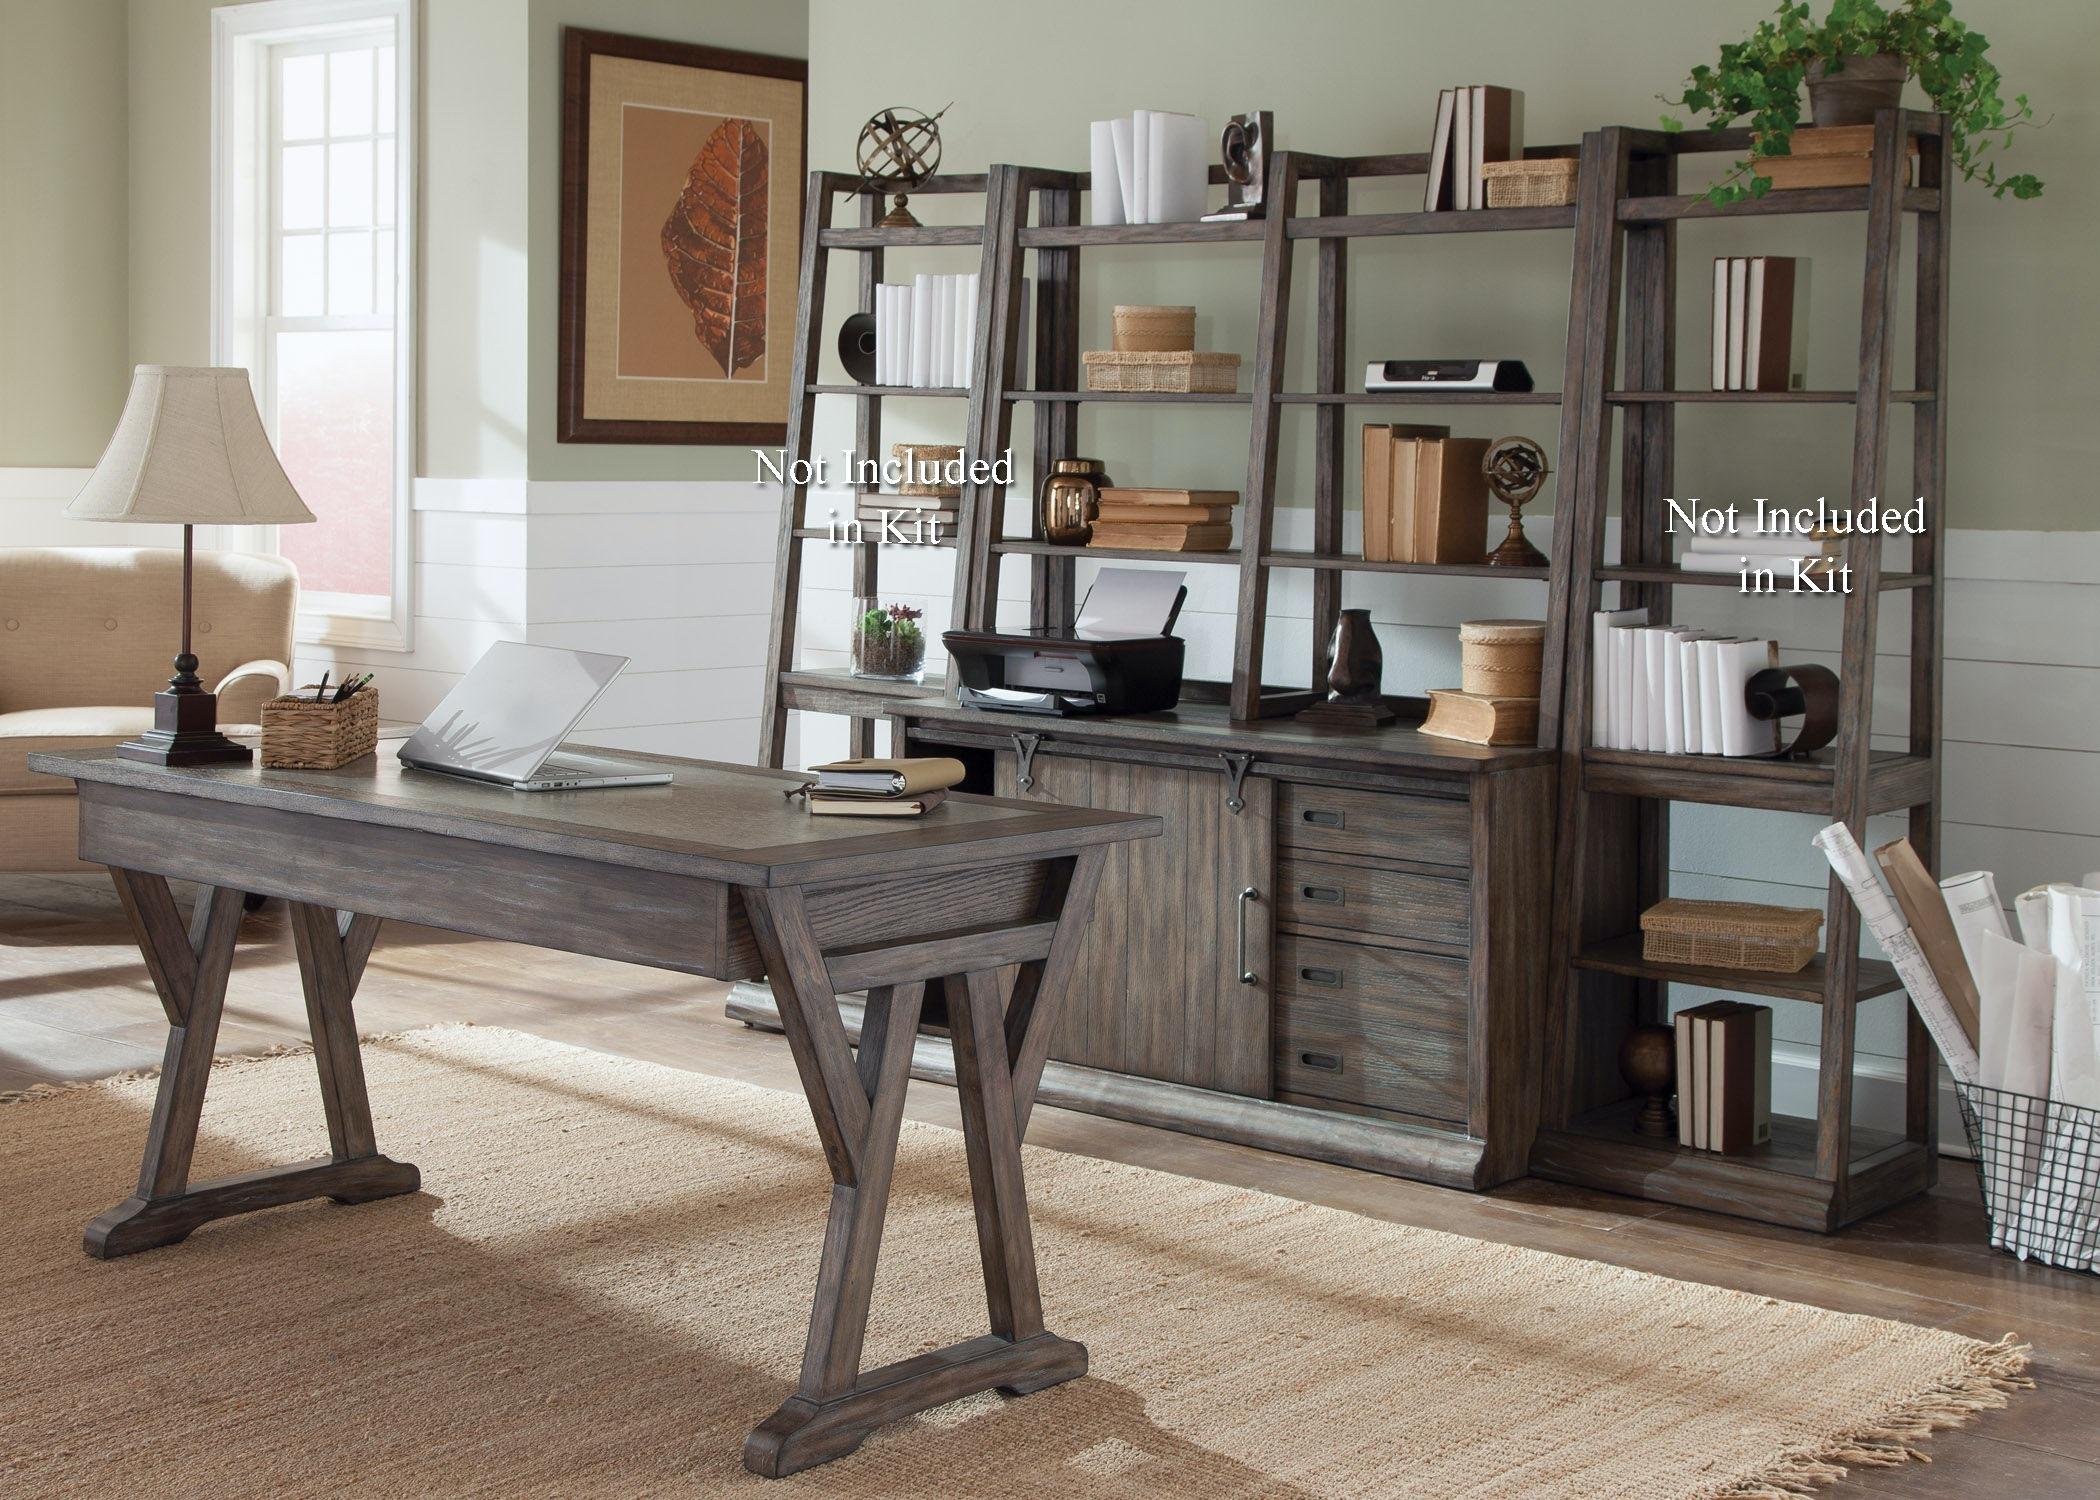 unique home office furniture. unique home office furniture grand rapids mi exclusive ideas